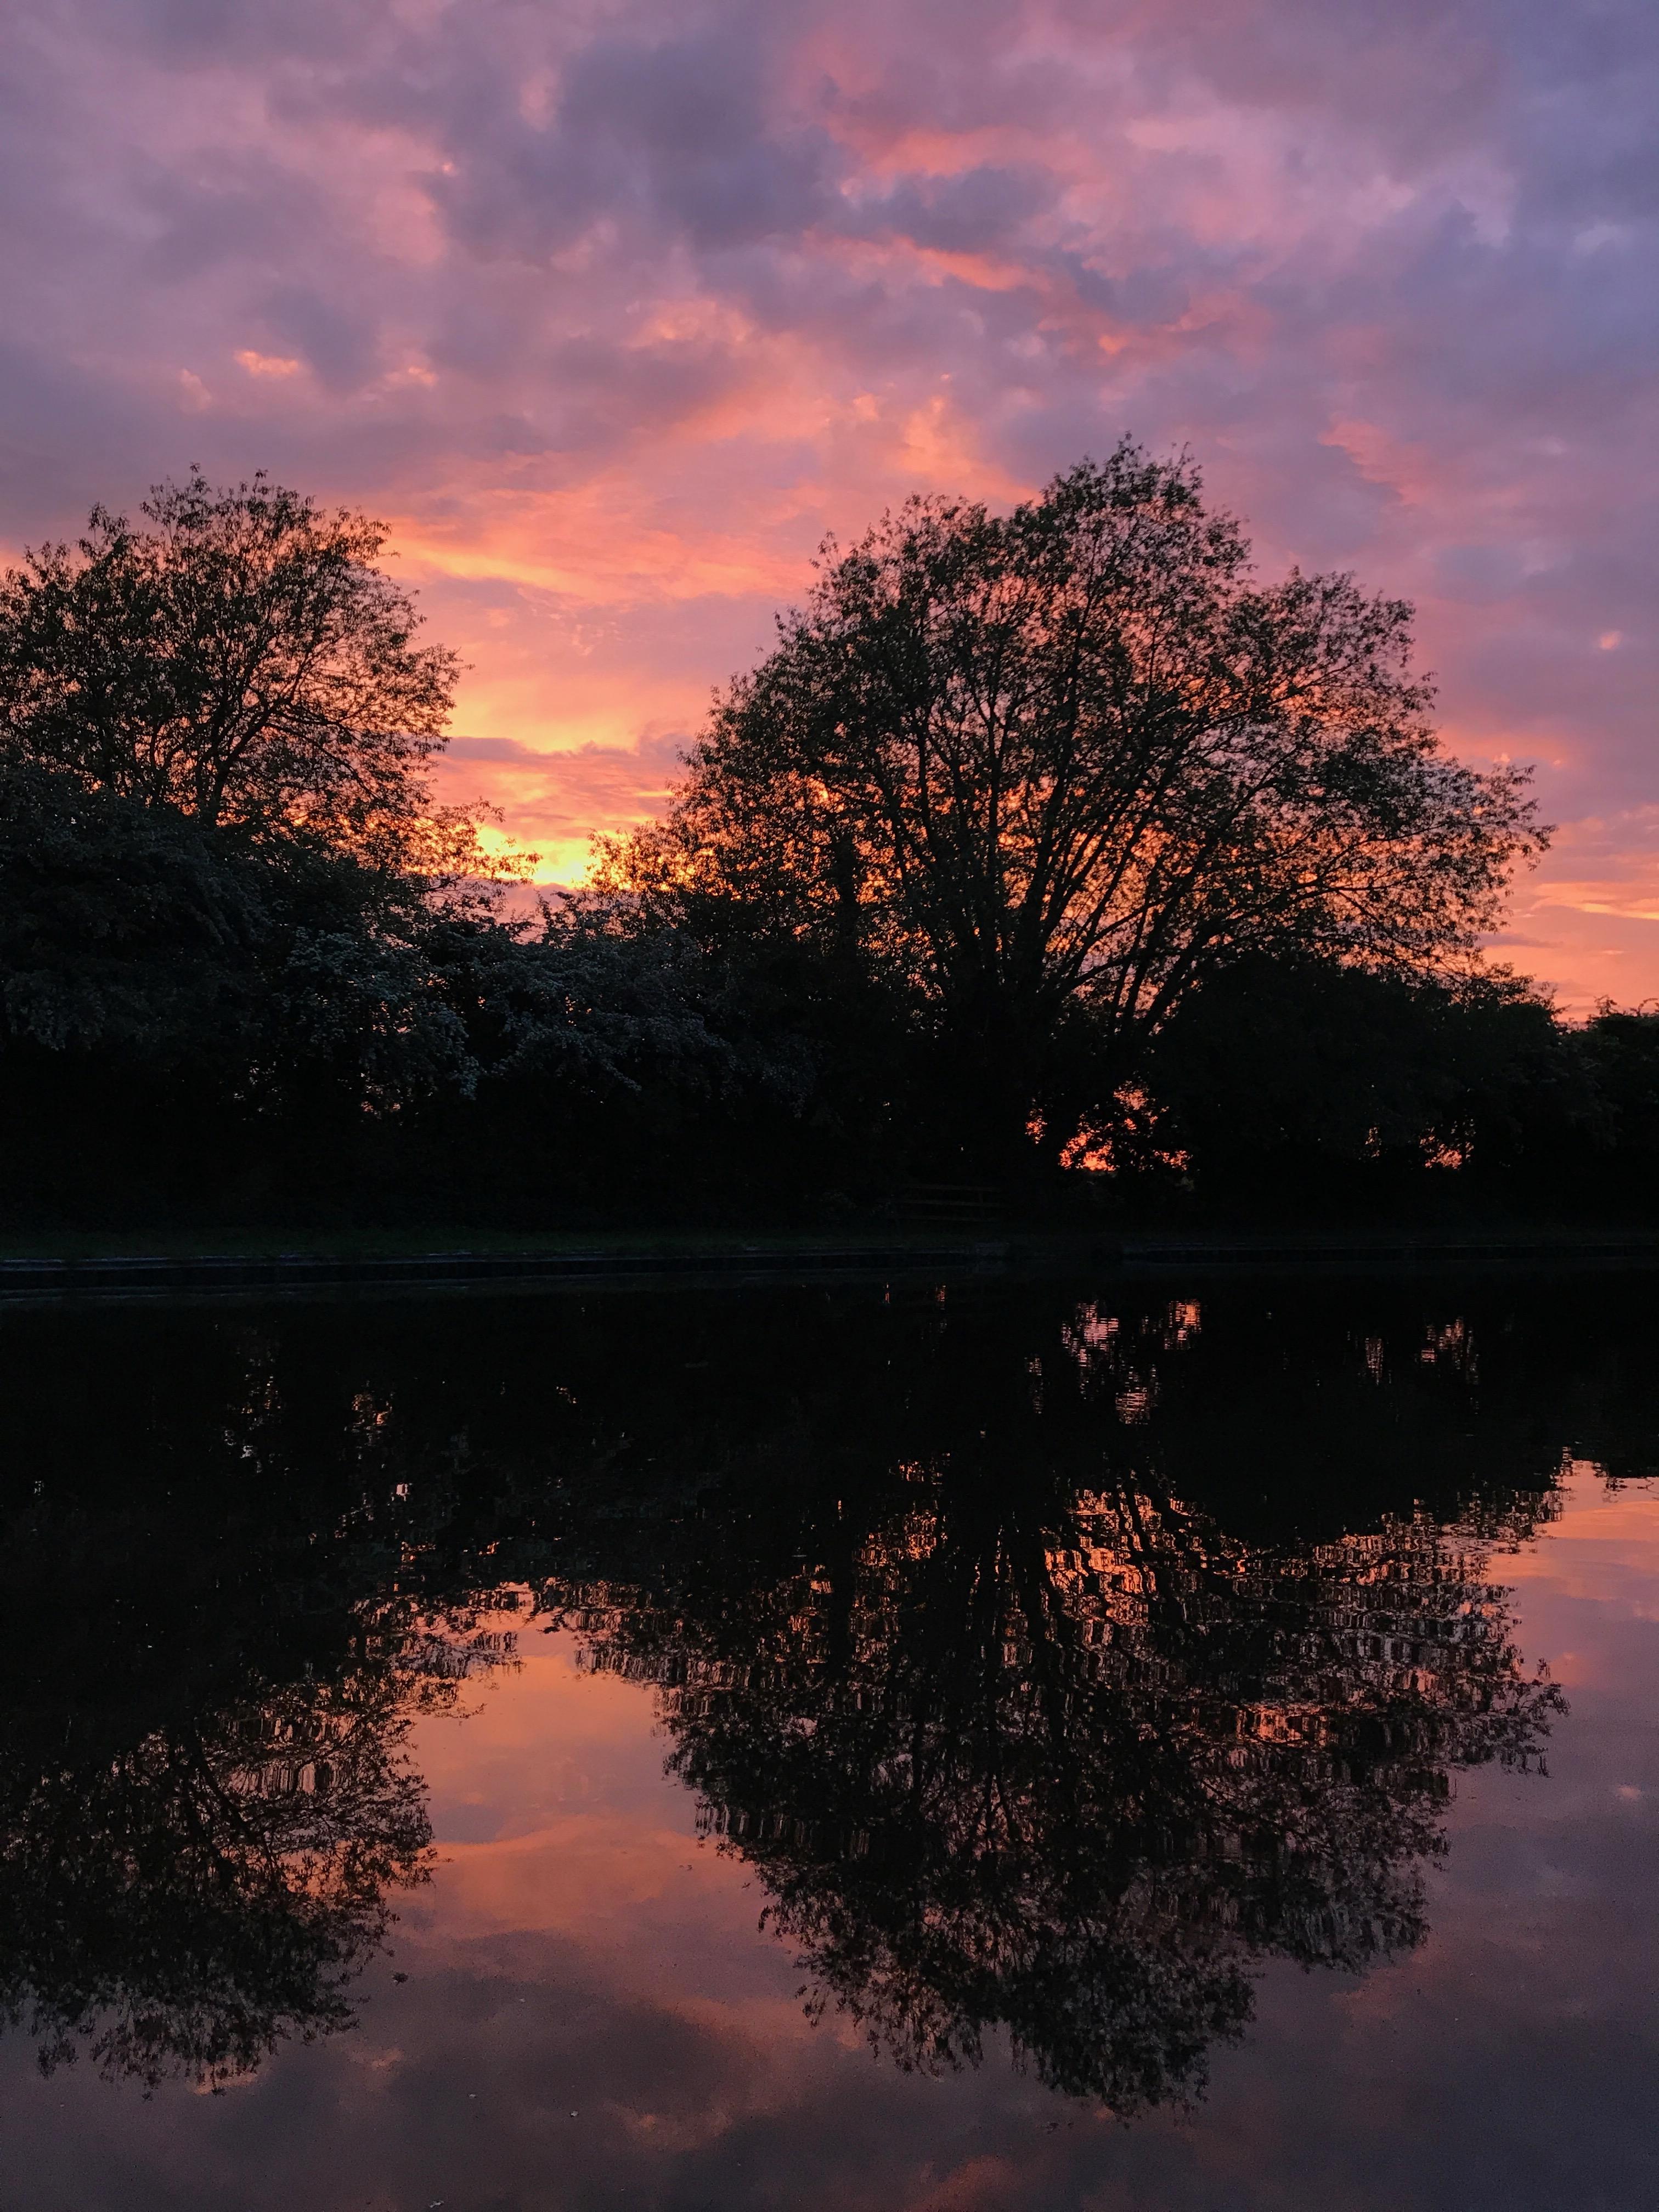 Pastel sunset sky